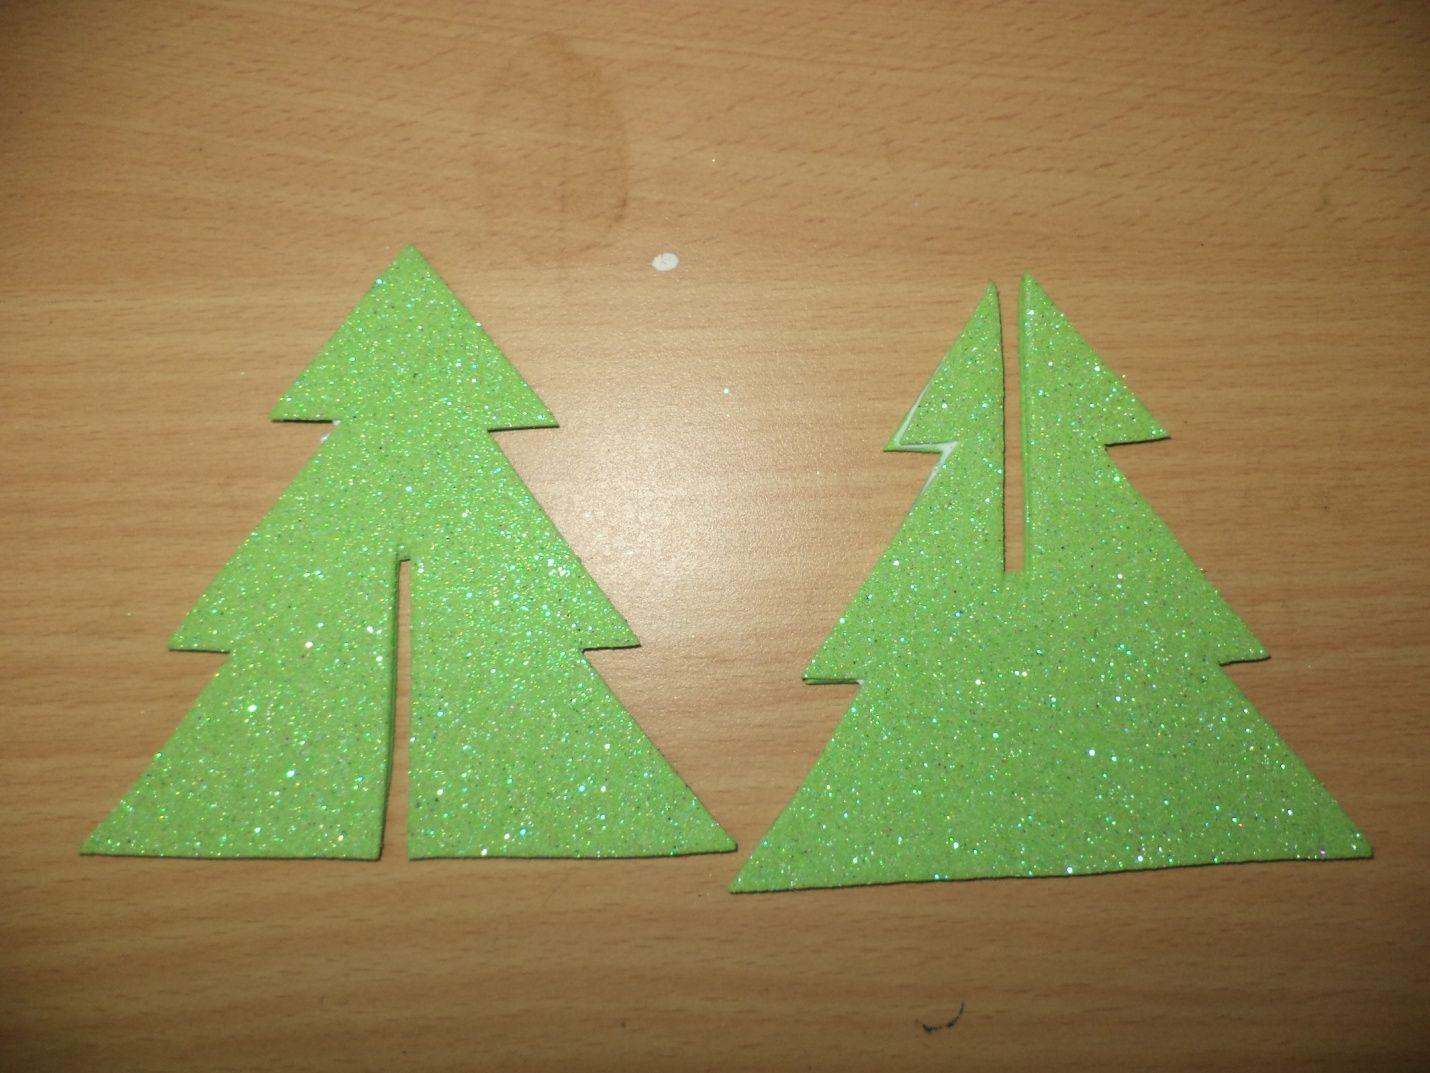 Glitter Paper Christmas Tree Paper Christmas Tree Glitter Paper Christmas Tree Crafts